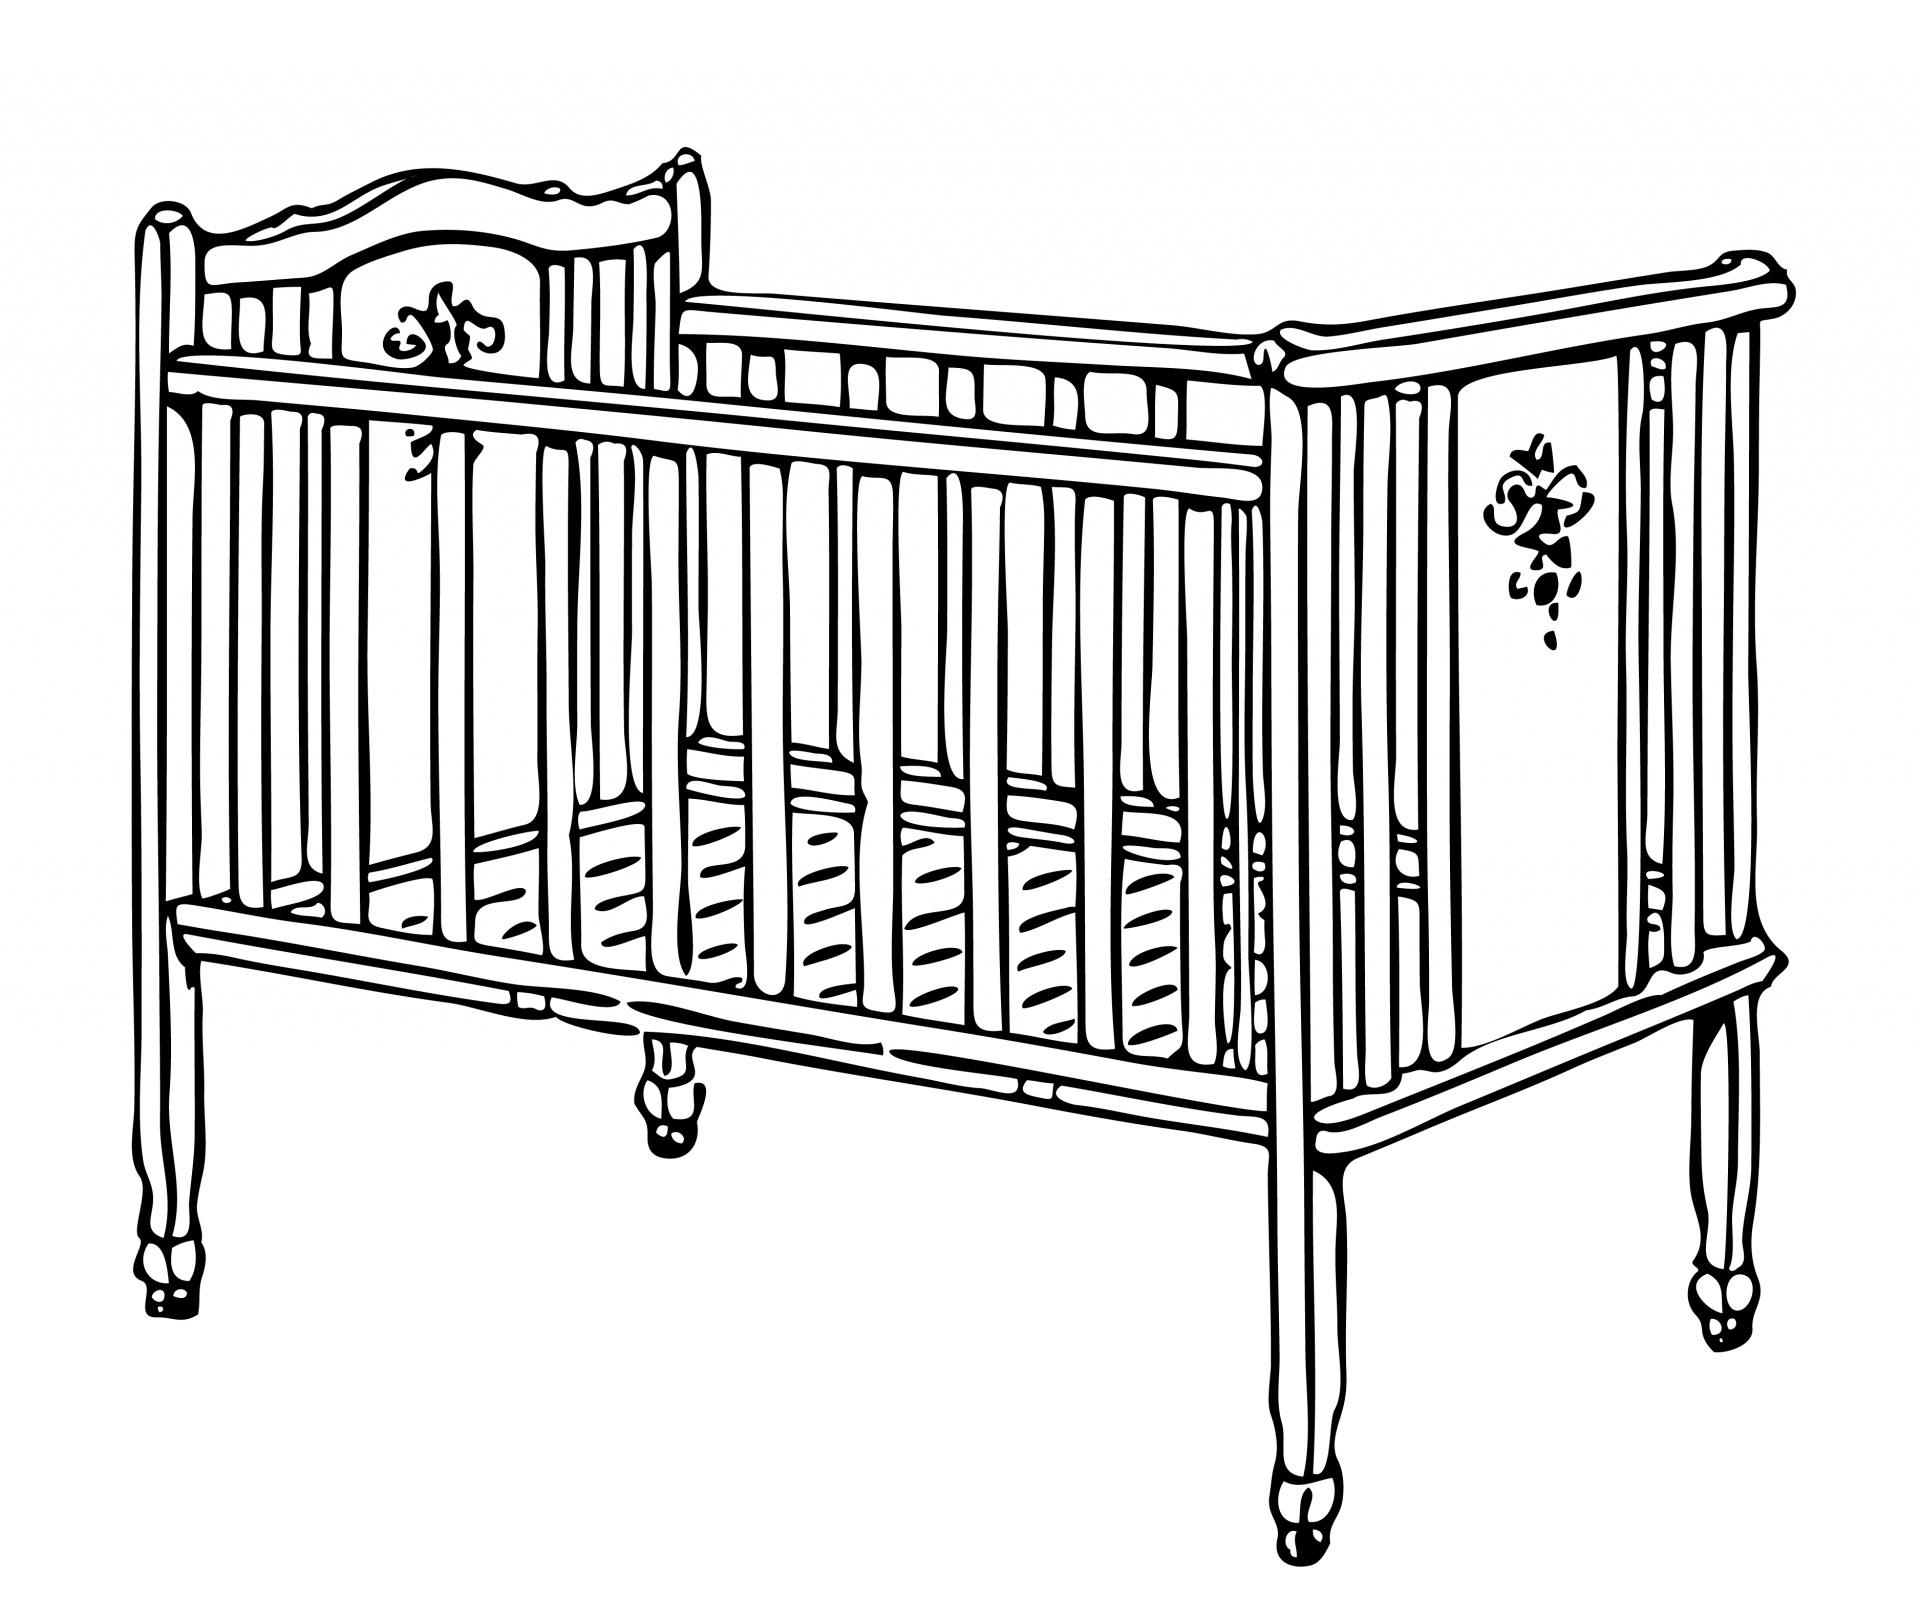 Crib, Cot Illustration Clipart Free Stock Photo.